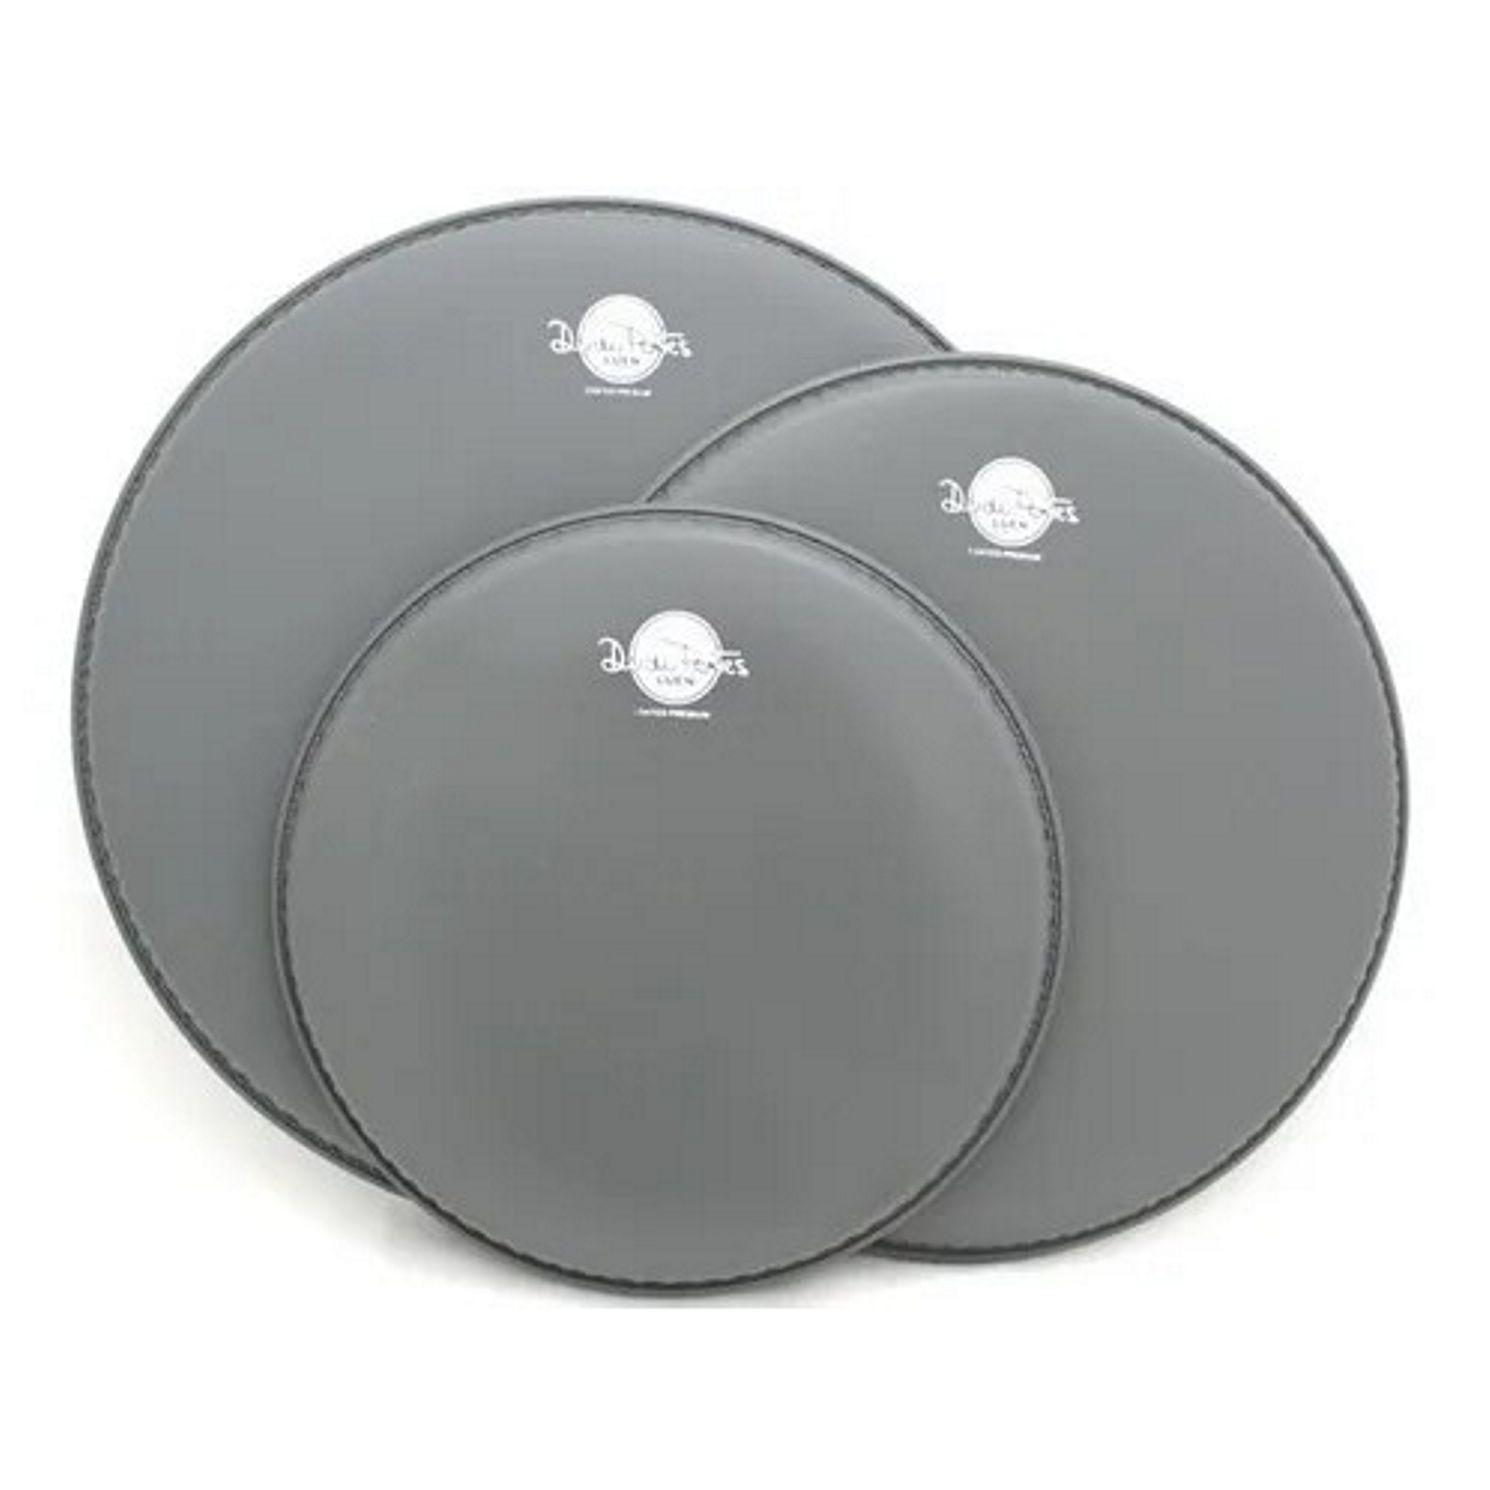 Jogo de Pele de Bateria 10 12 14 Coated Premium Dudu Portes Porosa - Luen